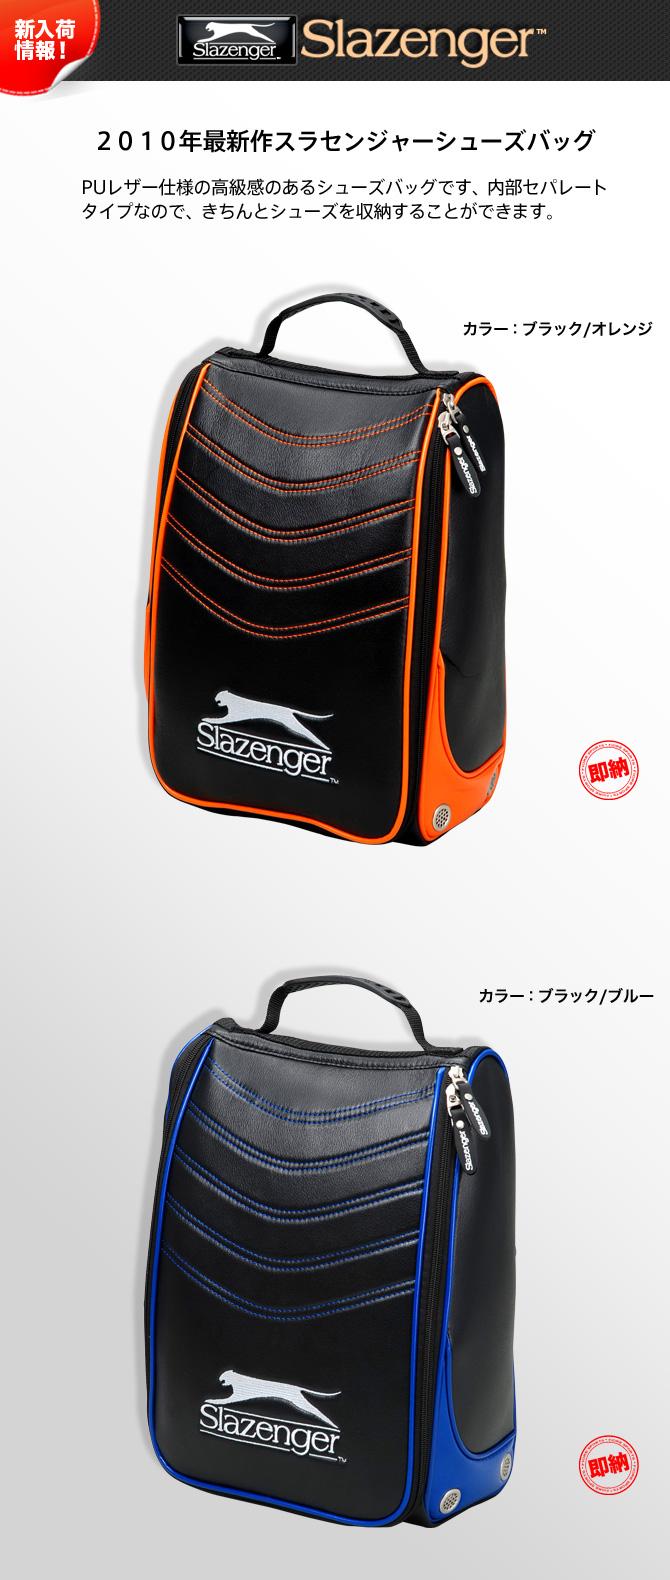 Slazenger Golf Shoes Bag Slazenger Shoes Bag